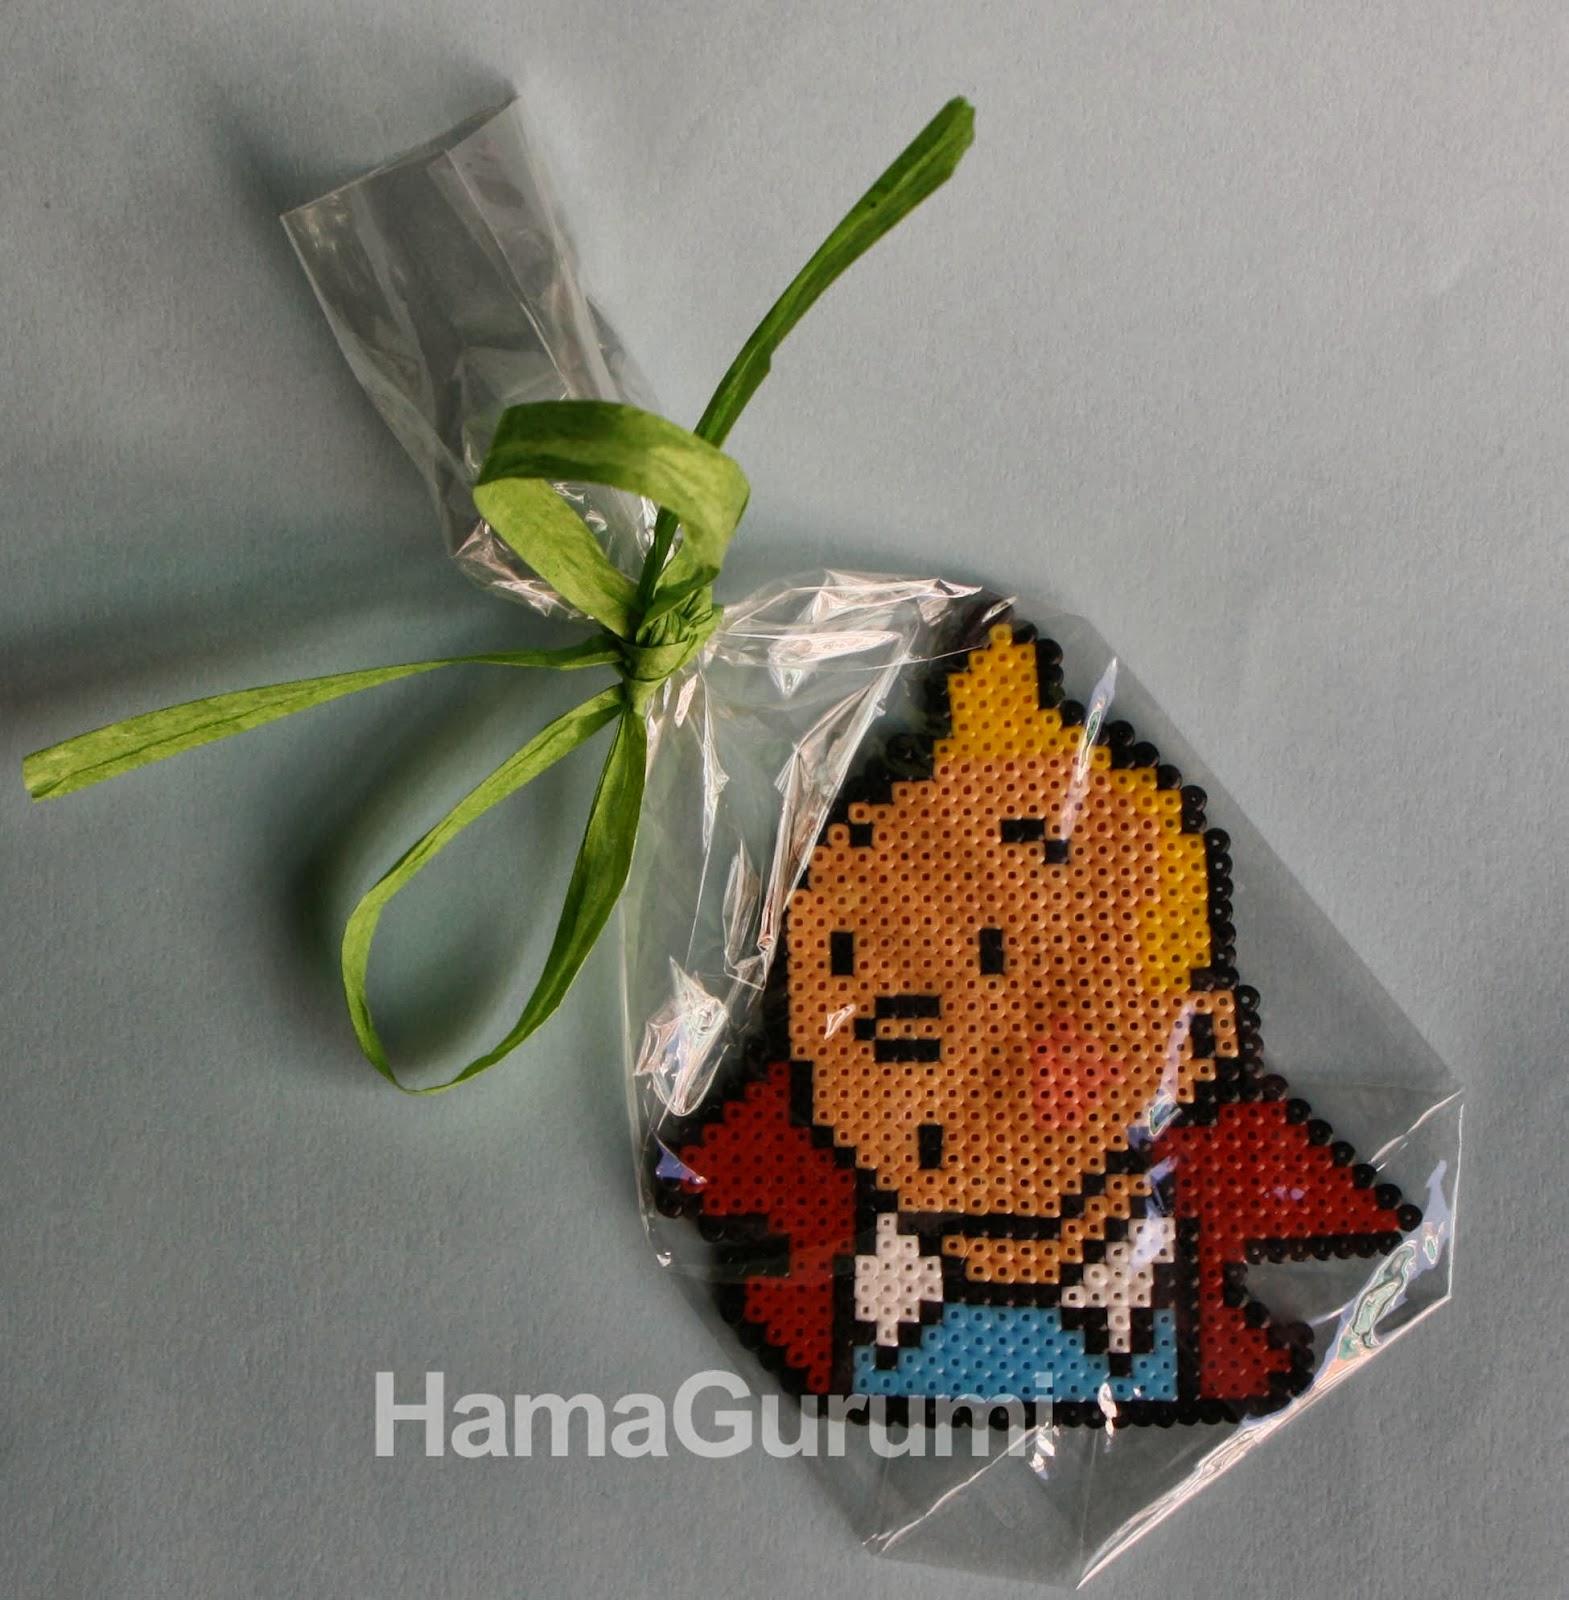 Trabajos HamaGurumi (Mini) - Página 2 Hamagurumi_hama_beads_tintin